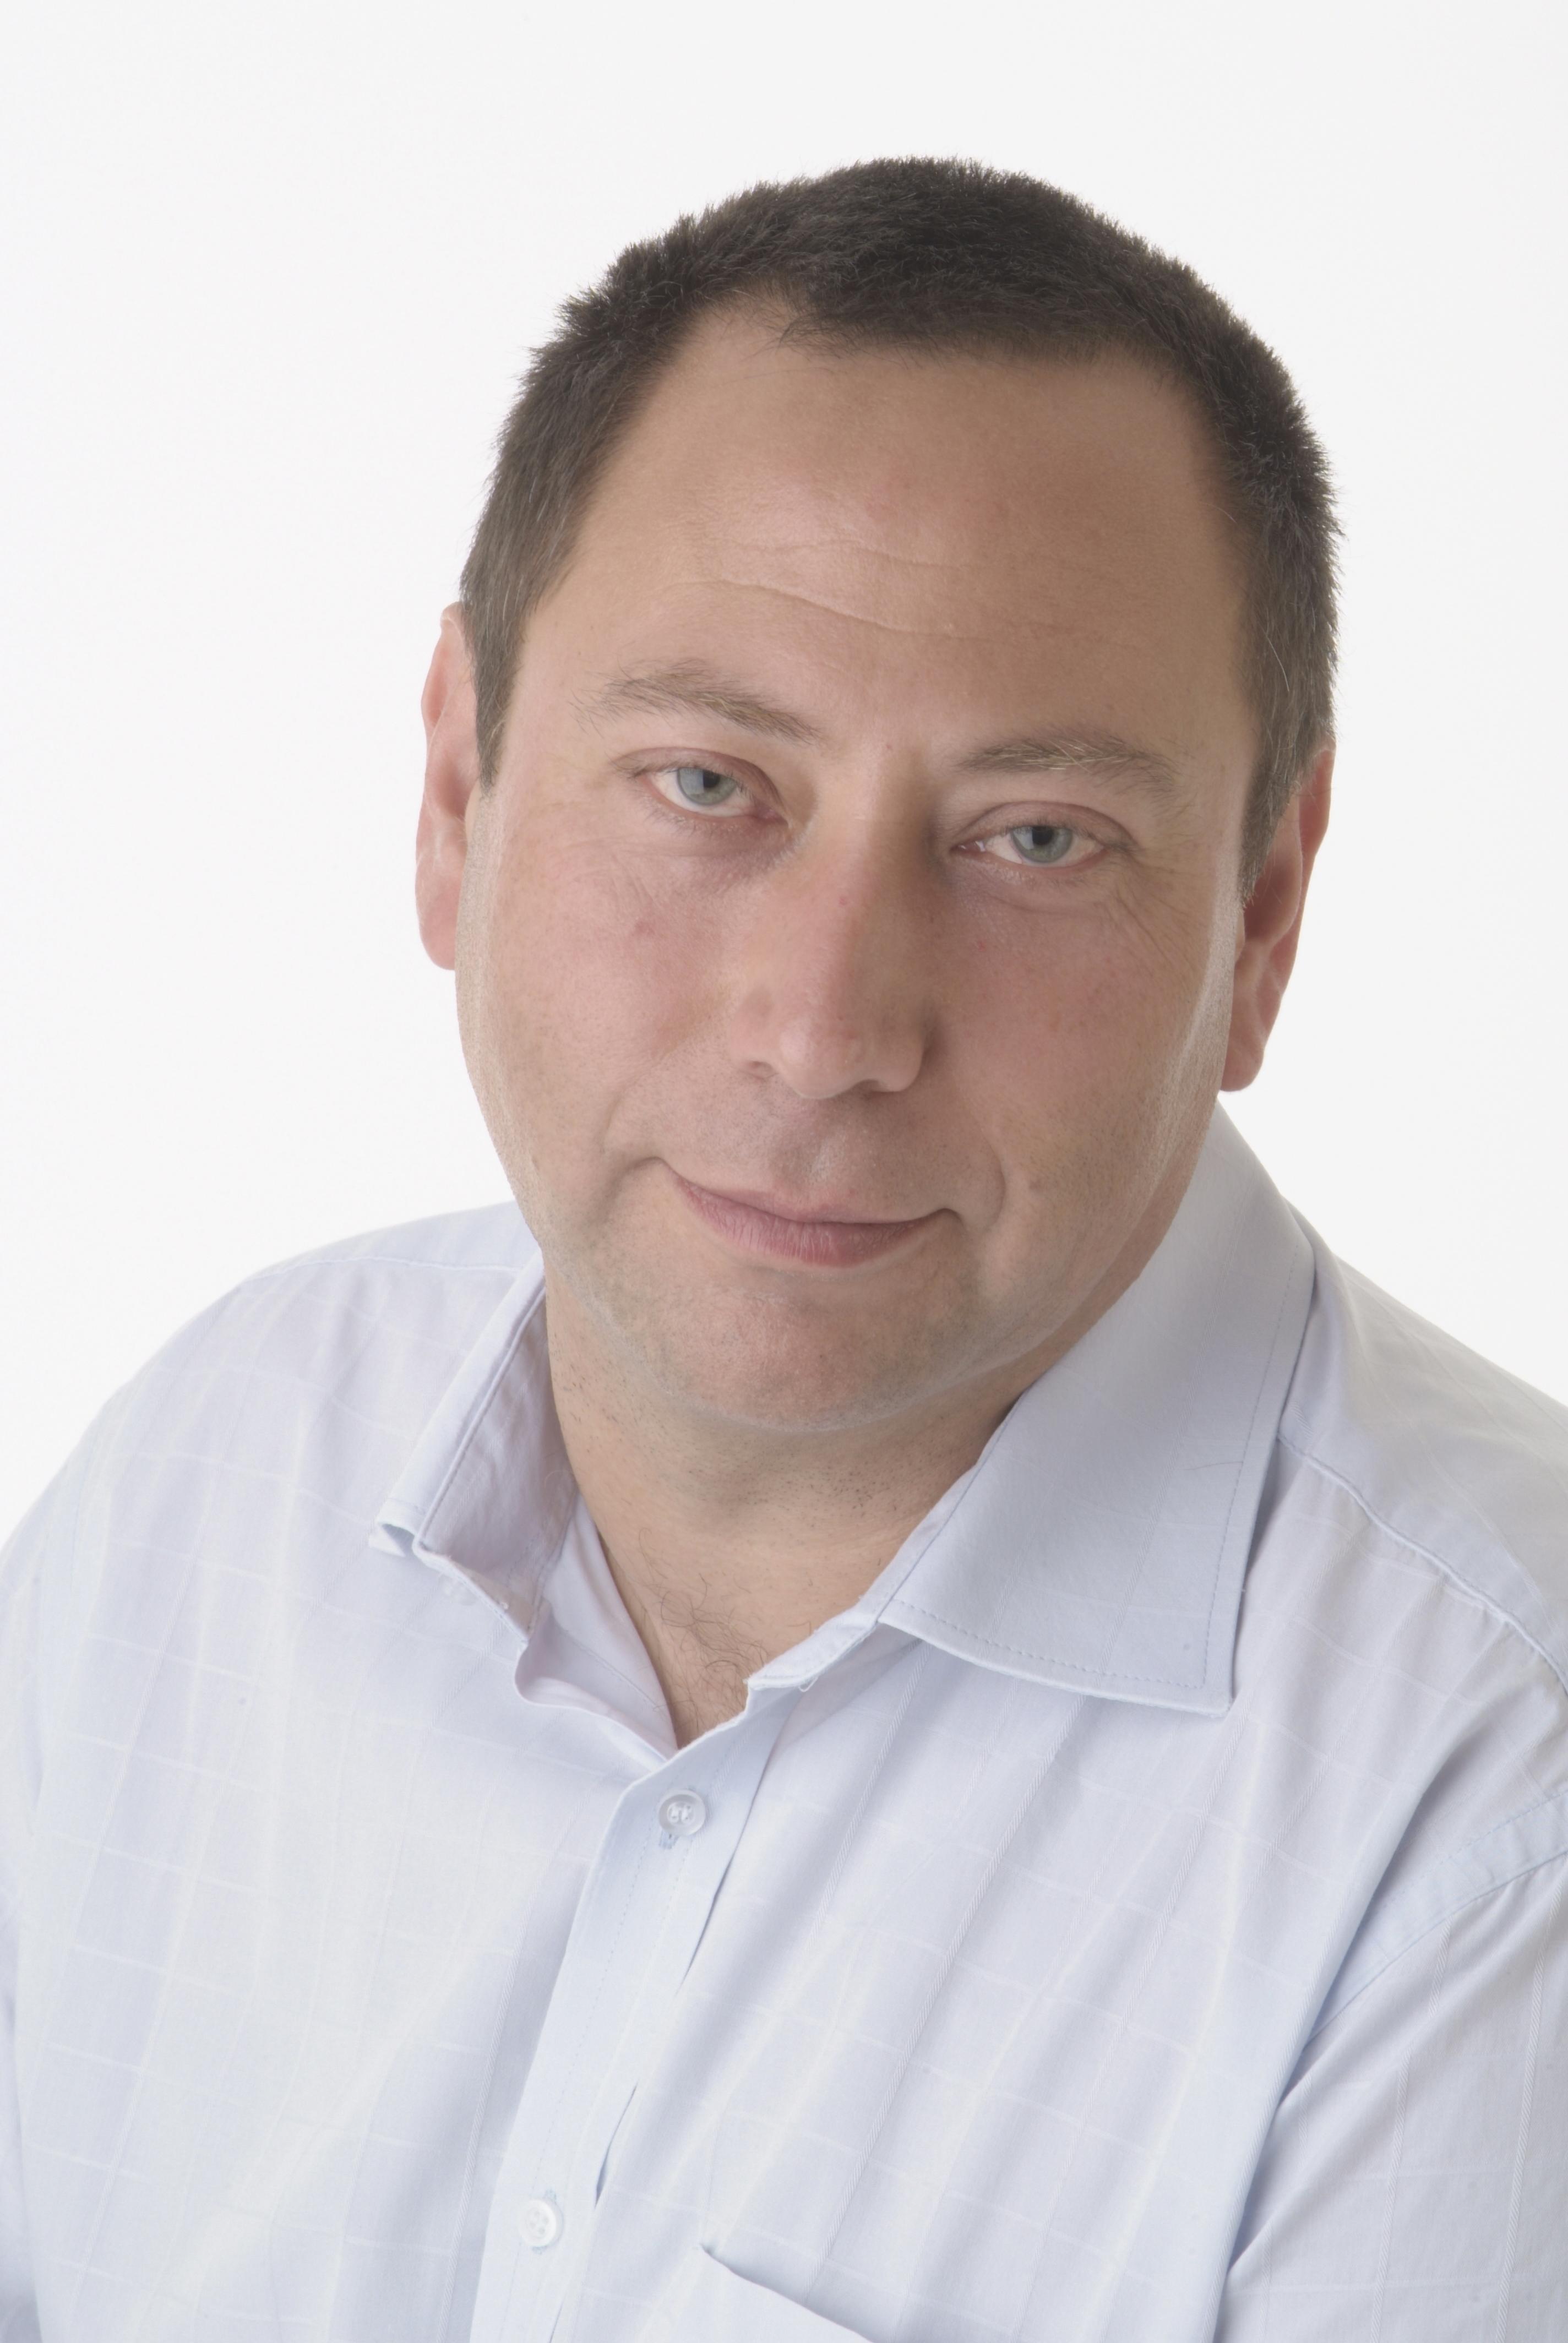 Steve Hobson